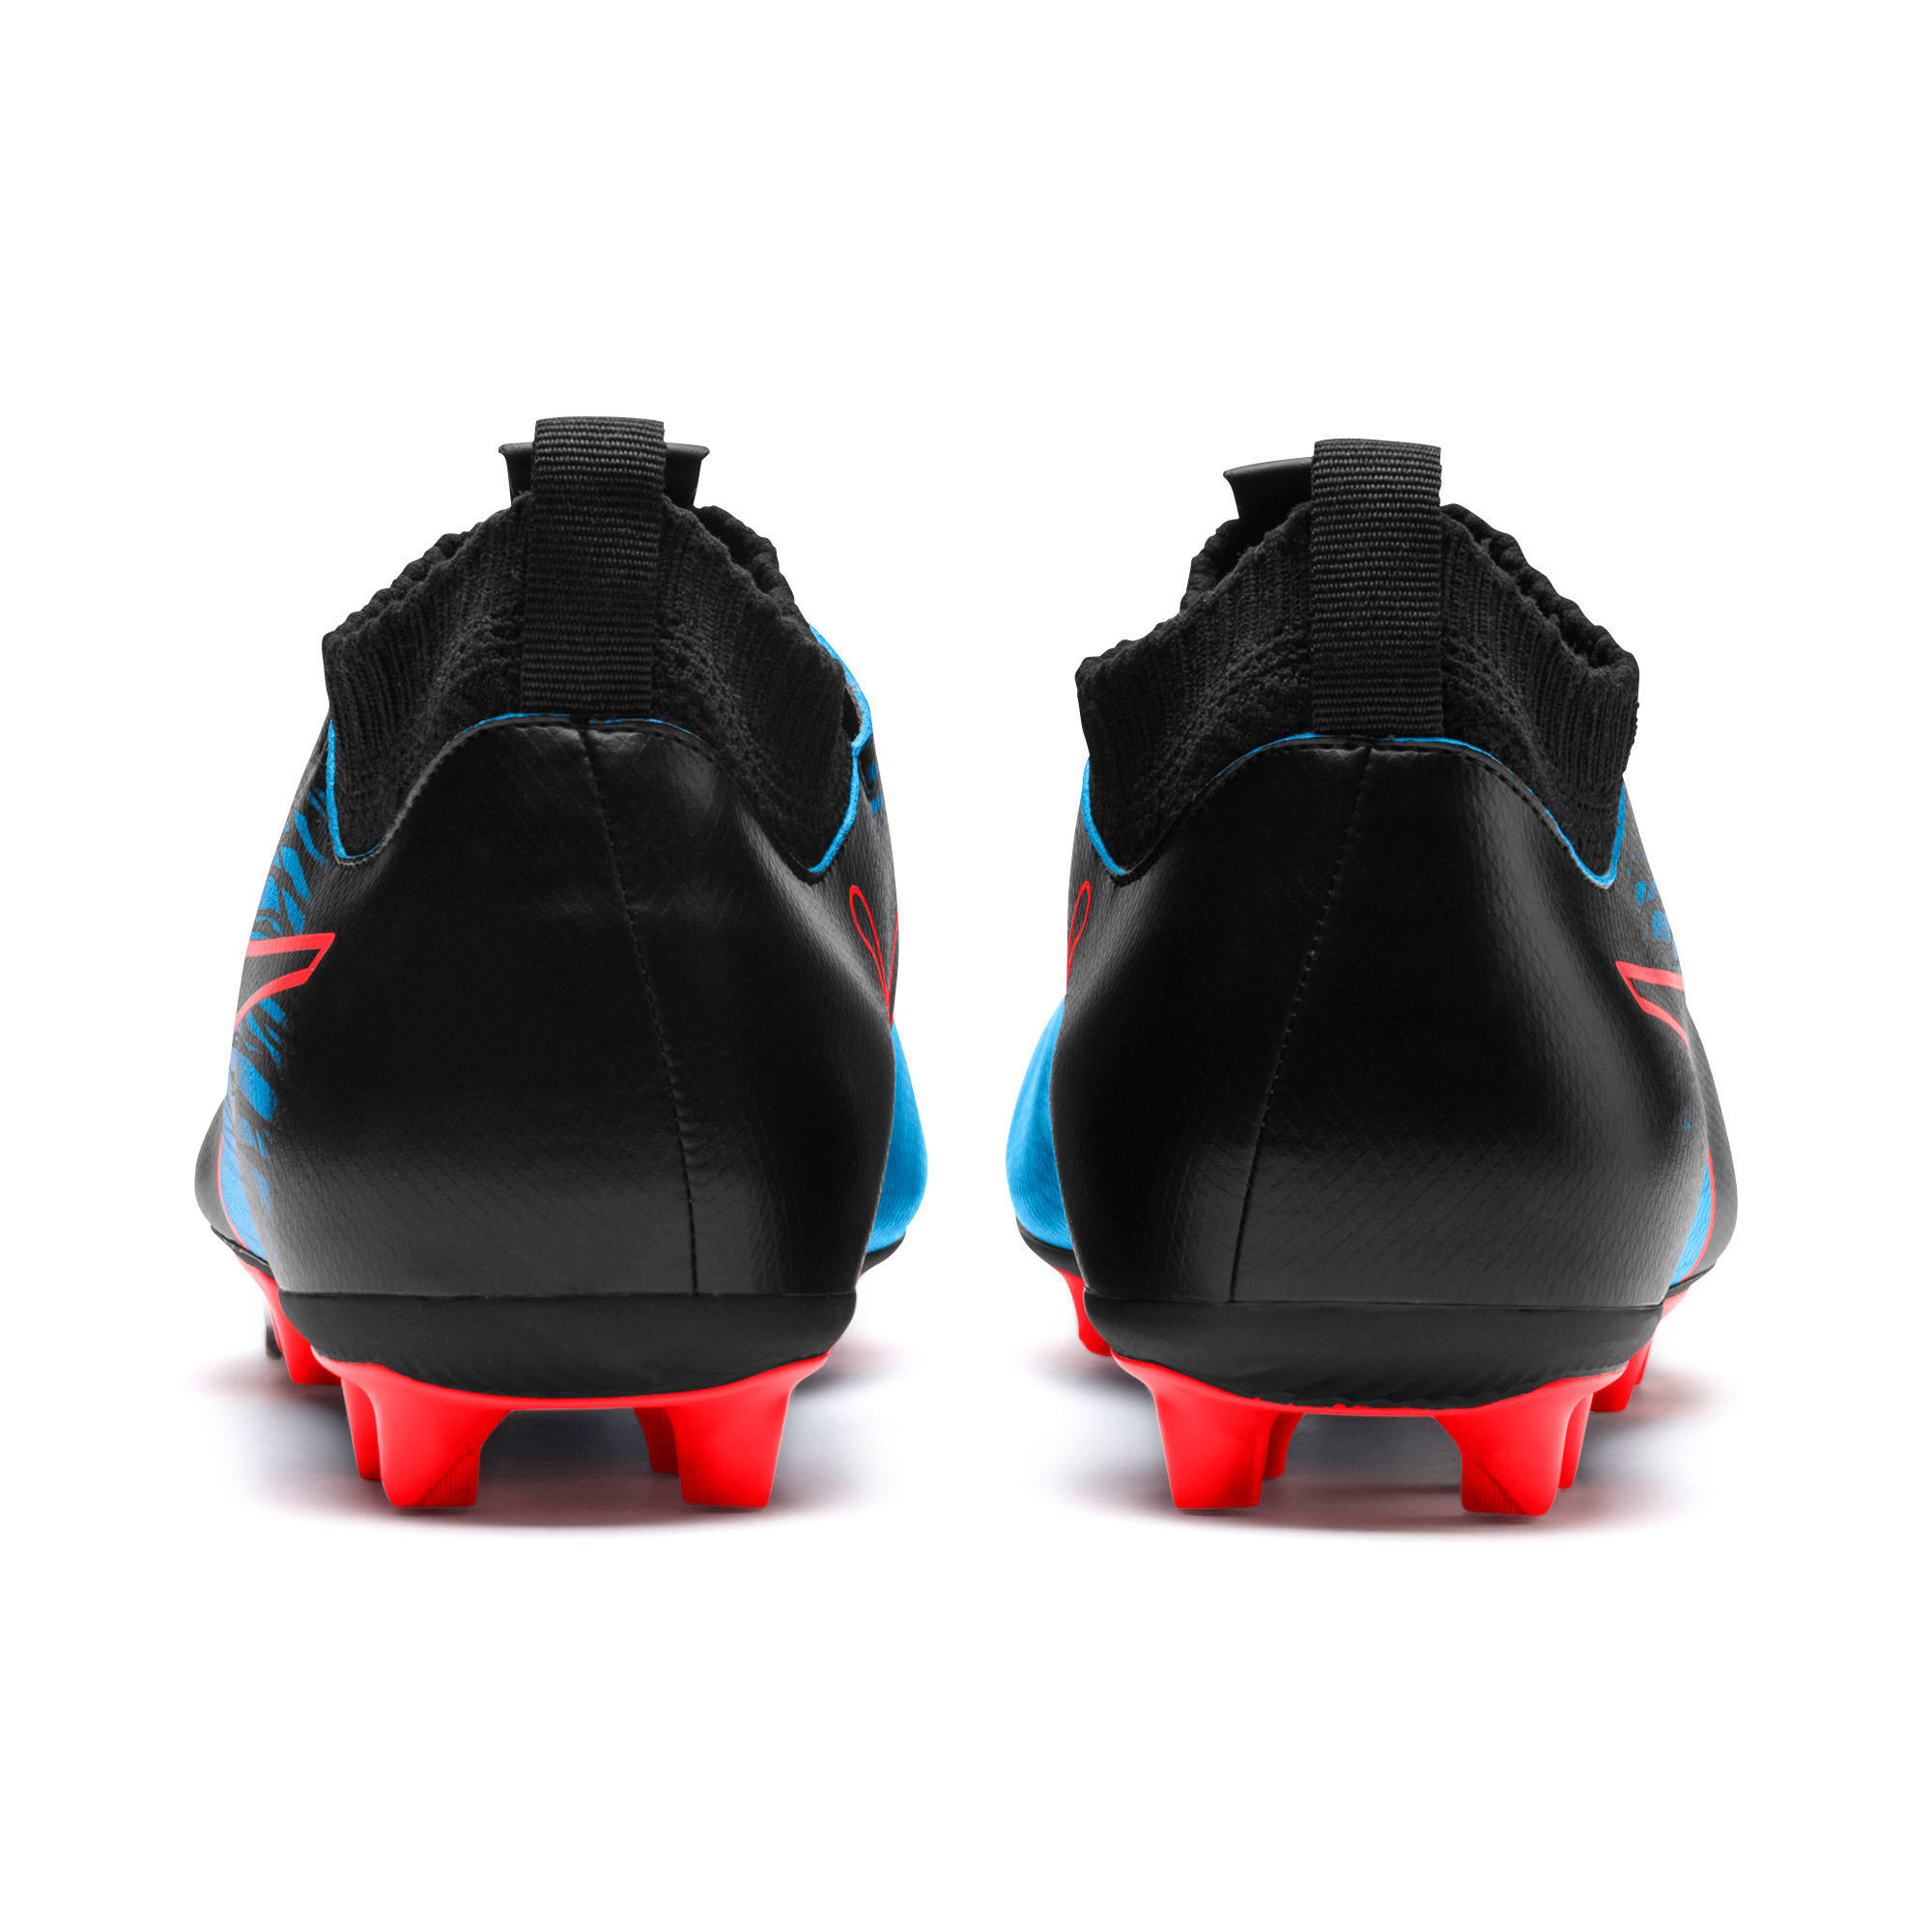 Thumbnail 2 of evoKNIT FTB II FG Men's Football Boots, Bleu Azur-Red Blast-Black, medium-IND